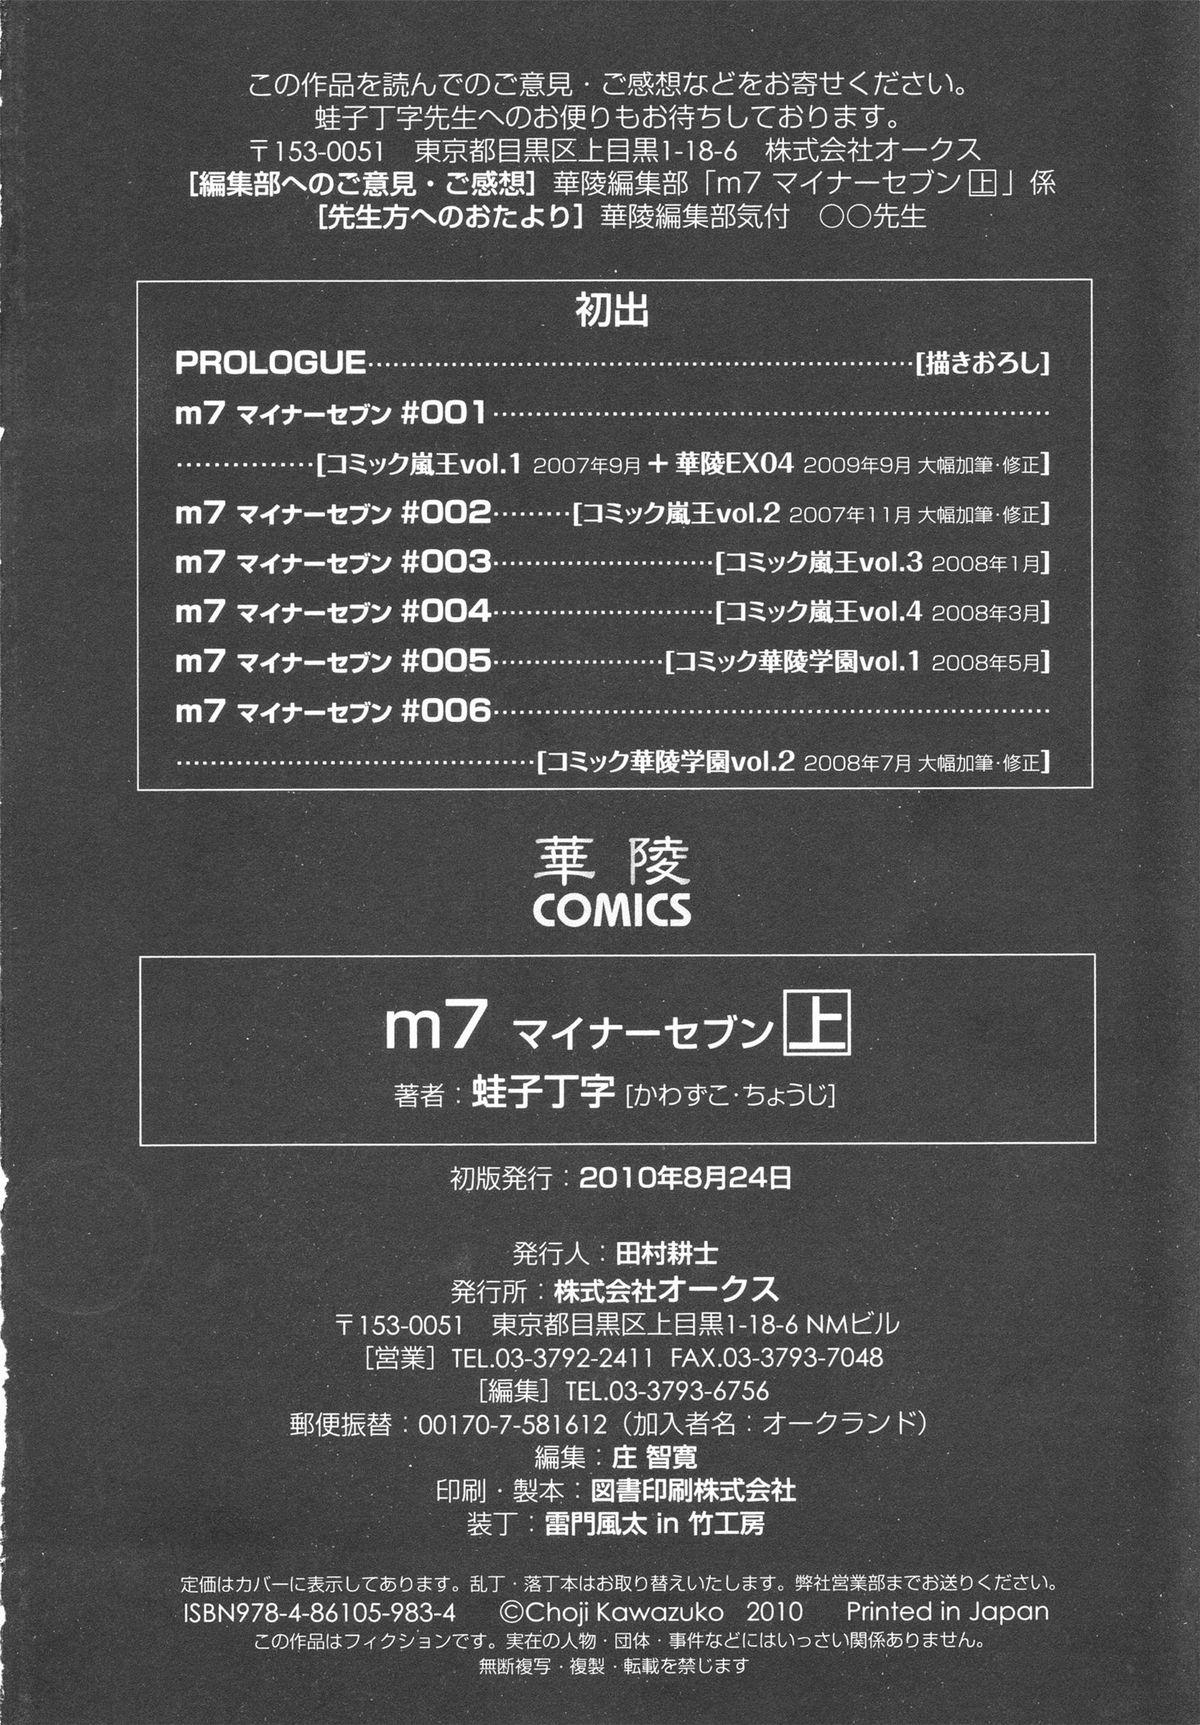 [Kawazuko Chouji] m7 -Minor Seven- Jou 211